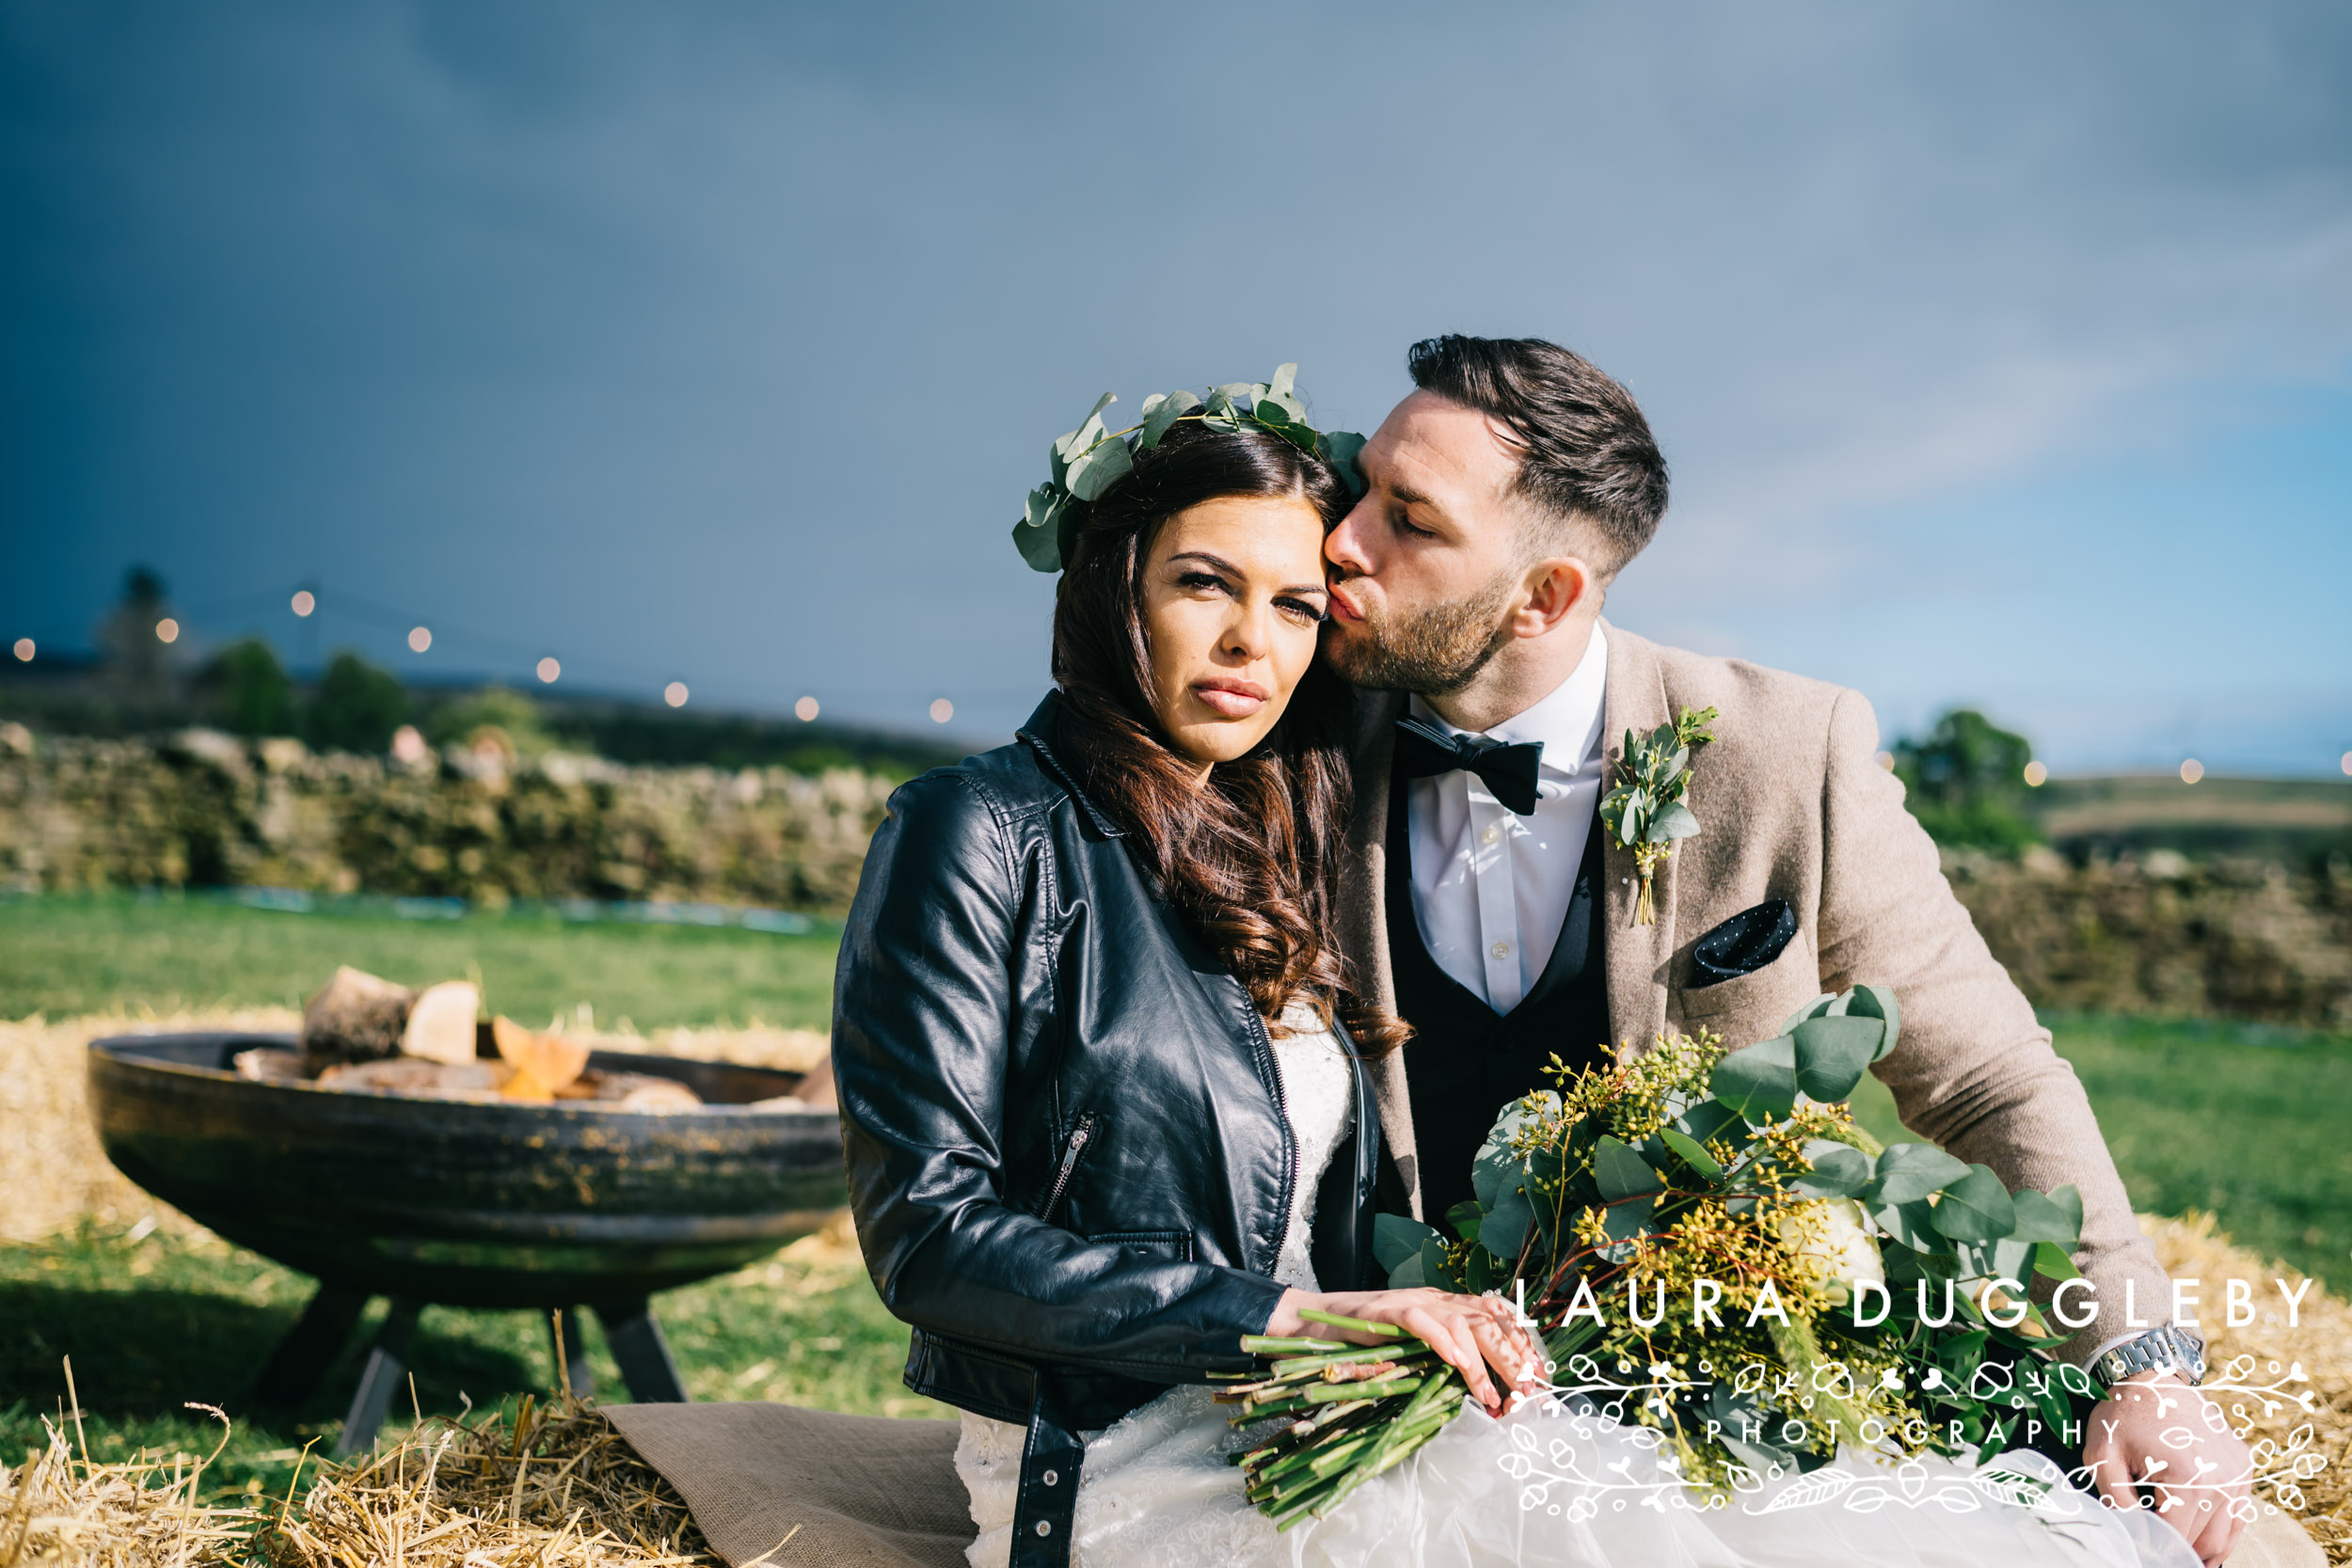 simply fields wedding photography - burnley wedding photographer